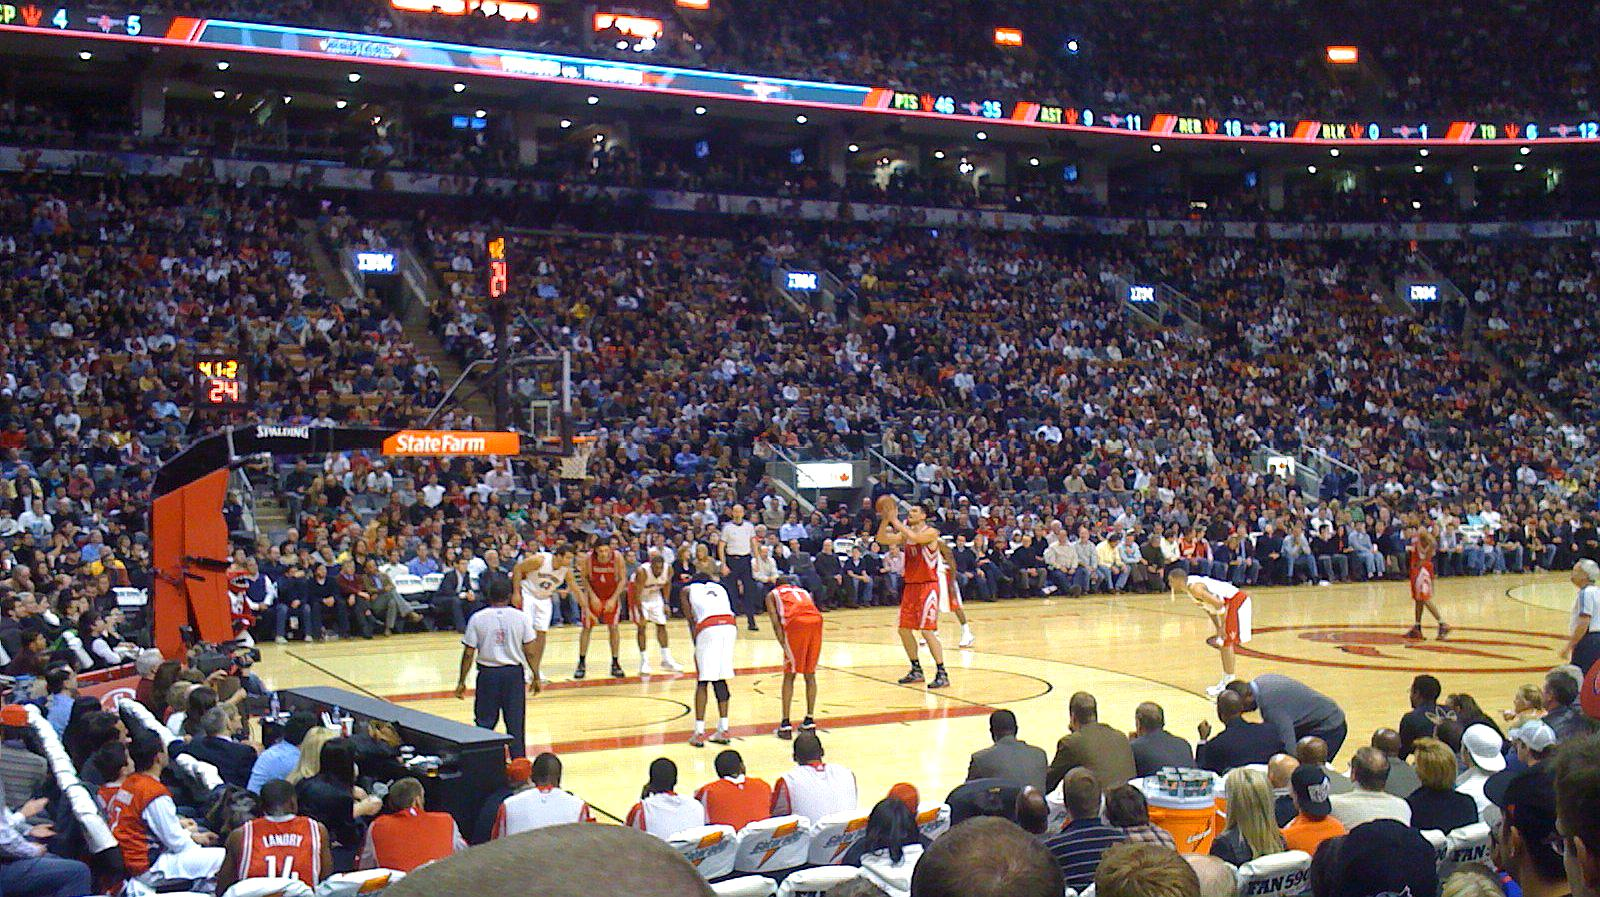 NBA中国赛上海站如期举行,场内座无虚席,NBA总裁:请多多理解